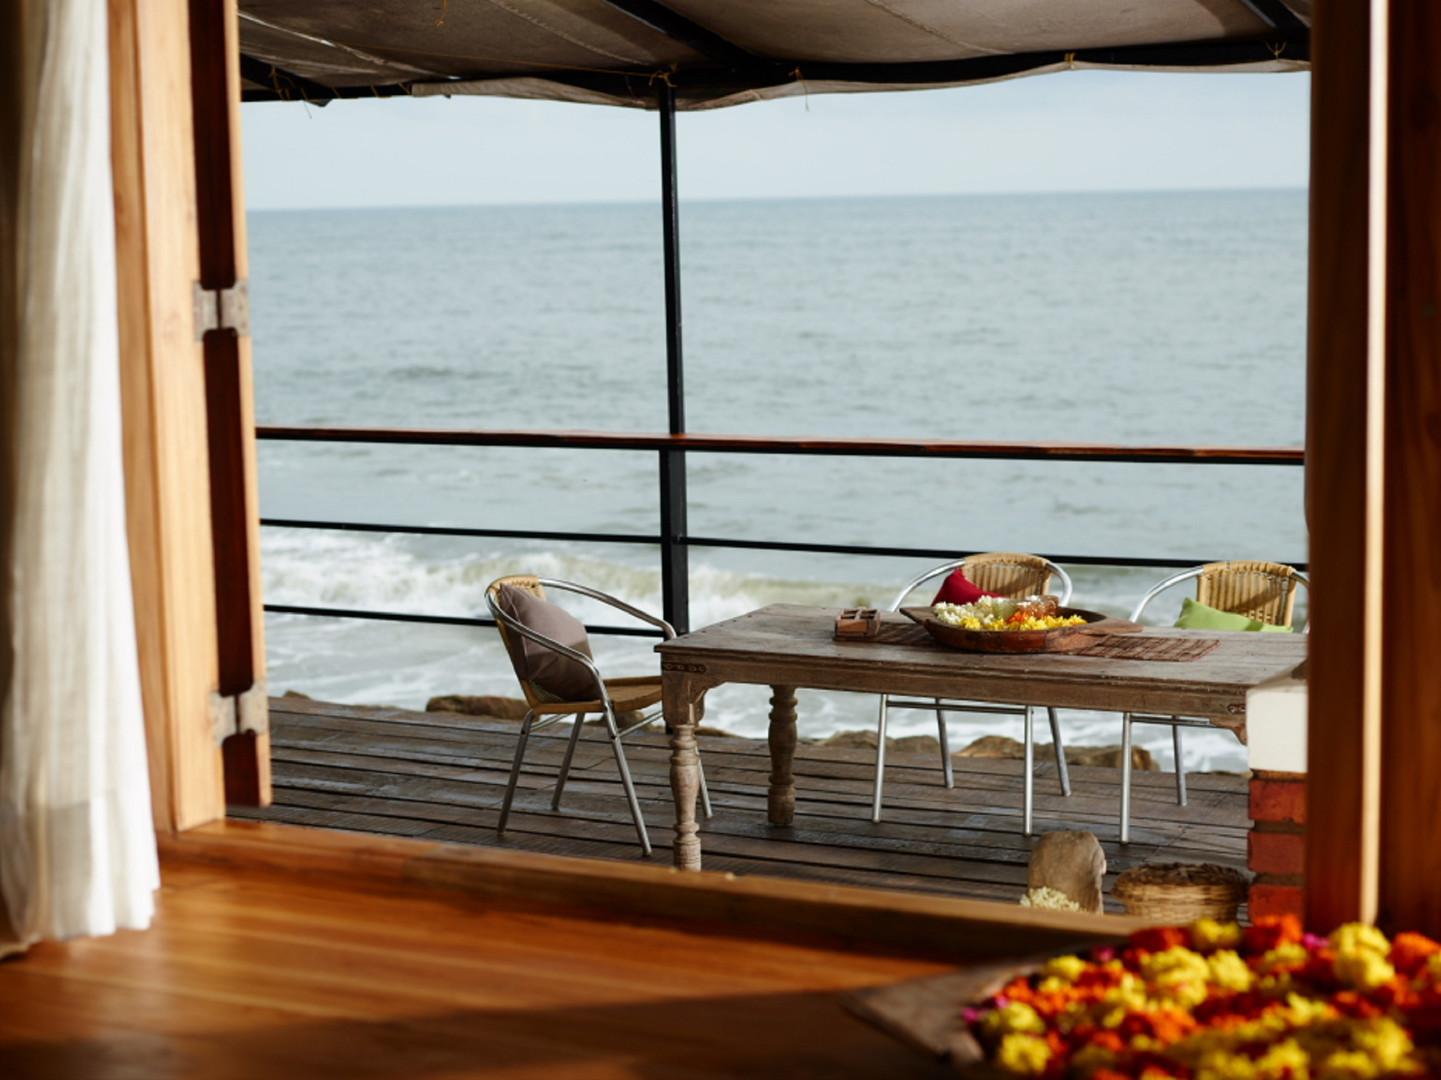 Photo galery - view on the Arabian Sea f